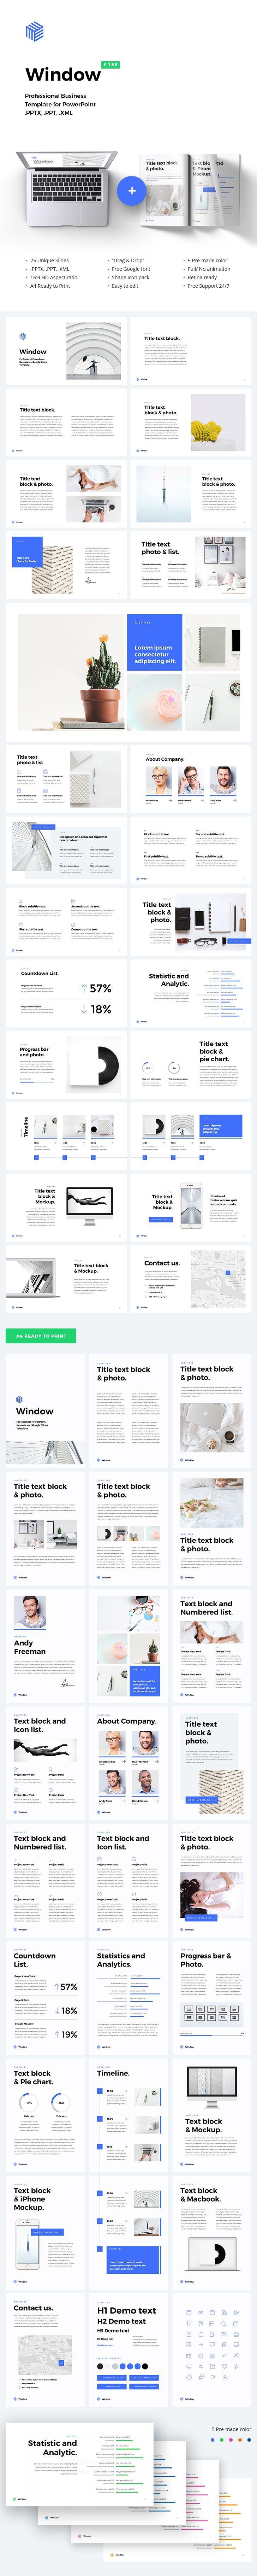 Best 25 windows powerpoint ideas on pinterest definition of new free powerpoint template window powerpoint ppt toneelgroepblik Images